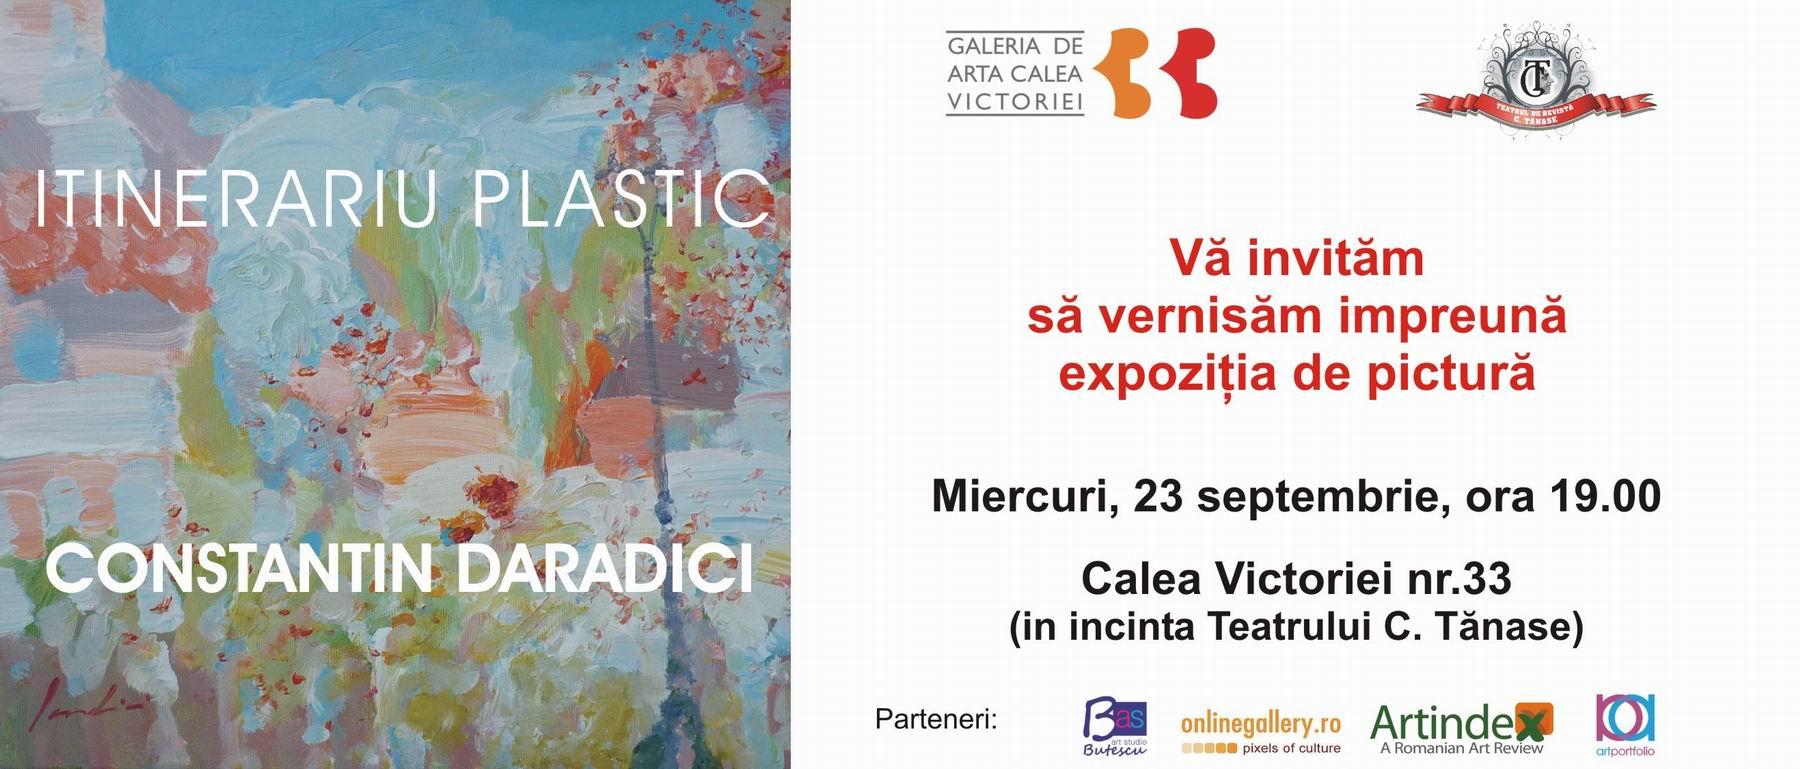 """ITINERARIU PLASTIC"" LA GALERIA CALEA VICTORIEI 33"